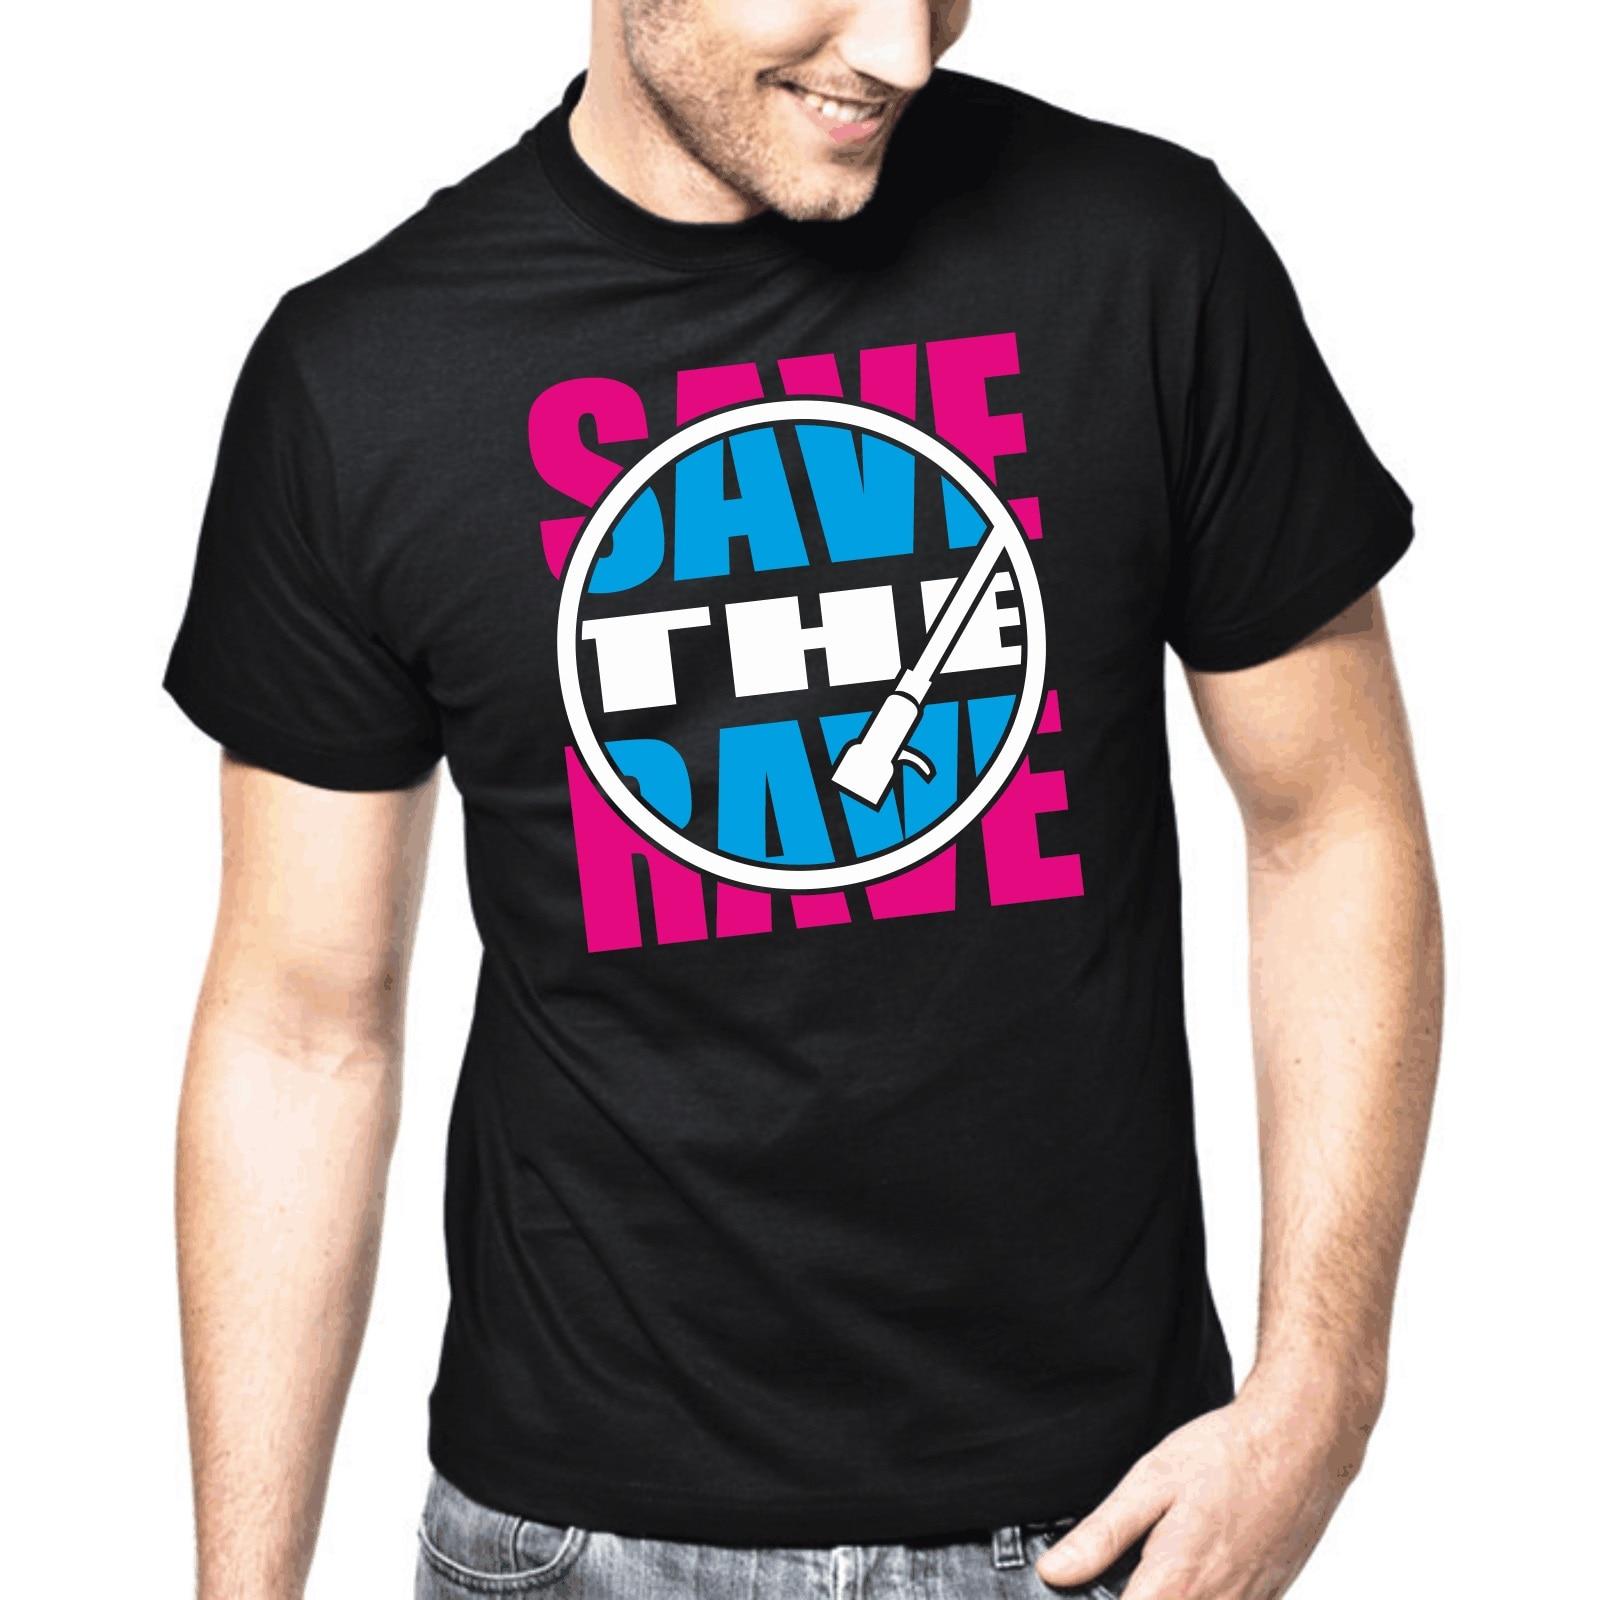 gildan Save the Rave  Techno  Electronic Music  Trance  DJ  Club men T-Shirt